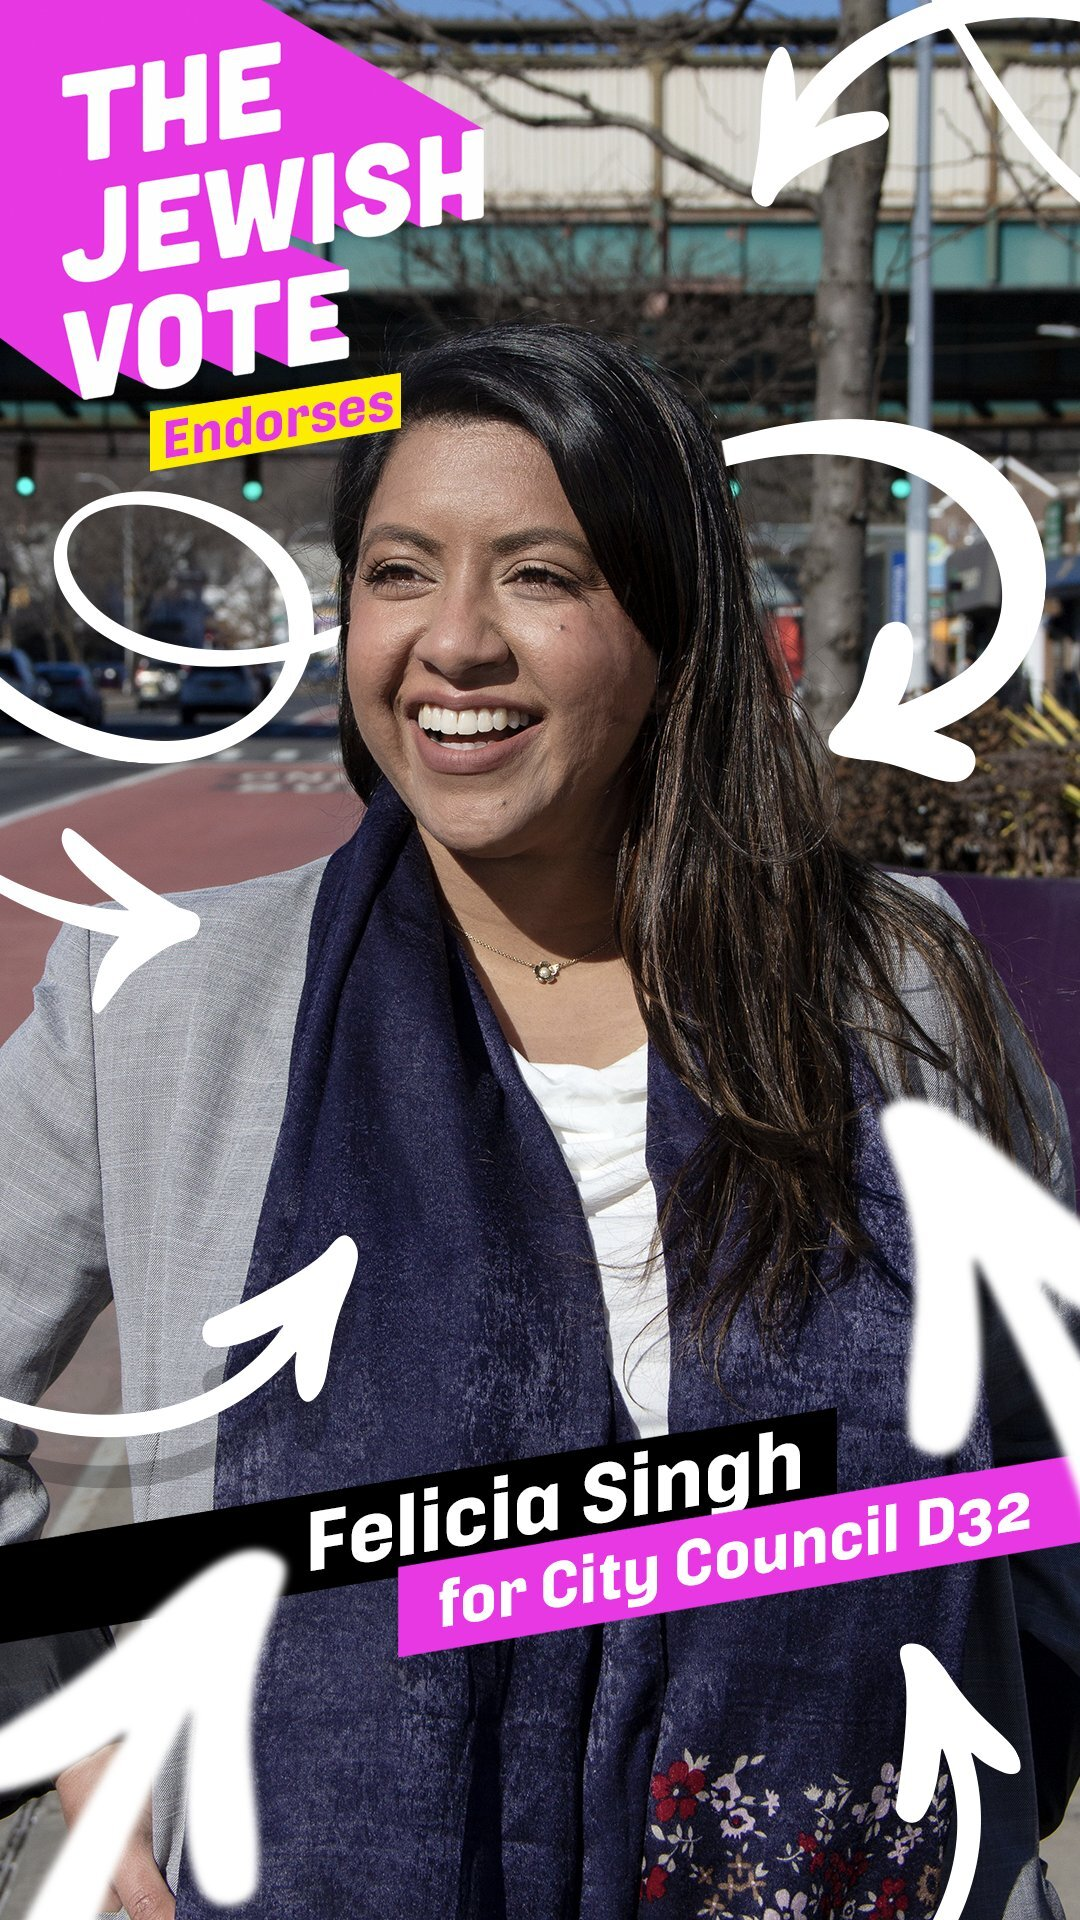 Felicia Singh